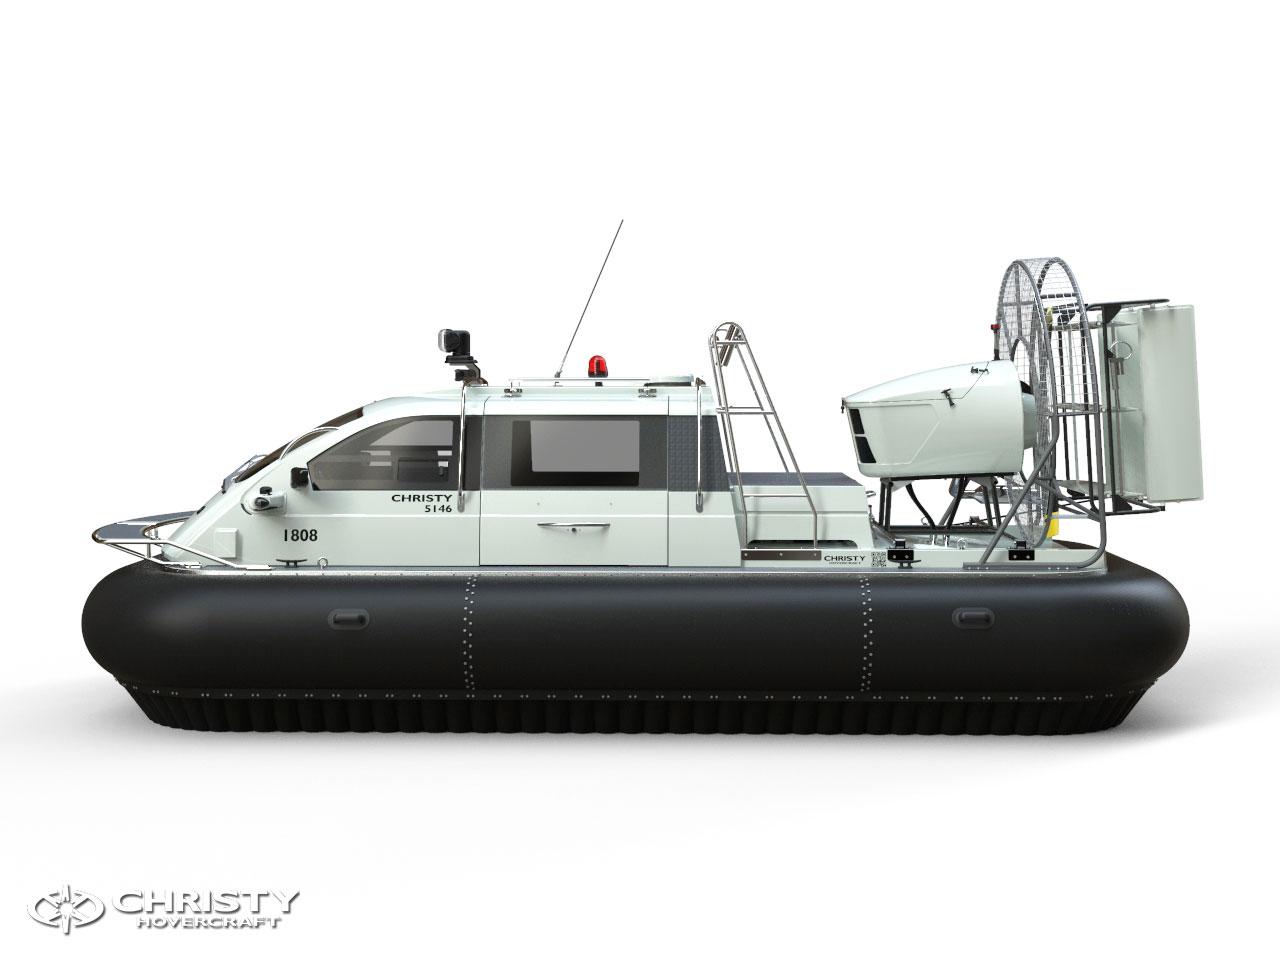 Hovercraft-Christy-5146-FC-Trolling-Edition-(3).jpg | фото №1